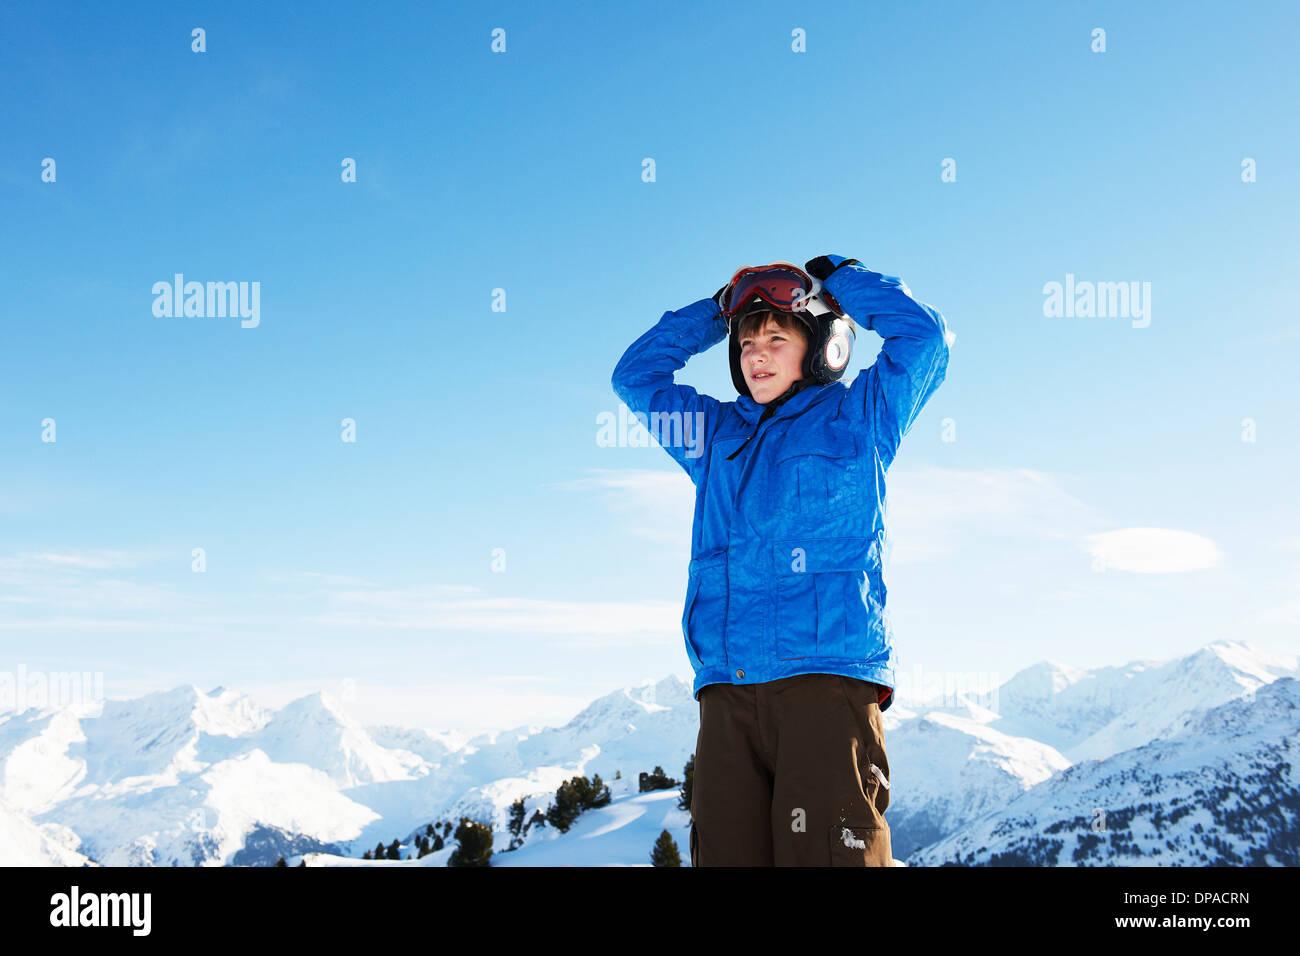 Portrait of boy with hands on head, Les Arcs, Haute-Savoie, France Photo Stock